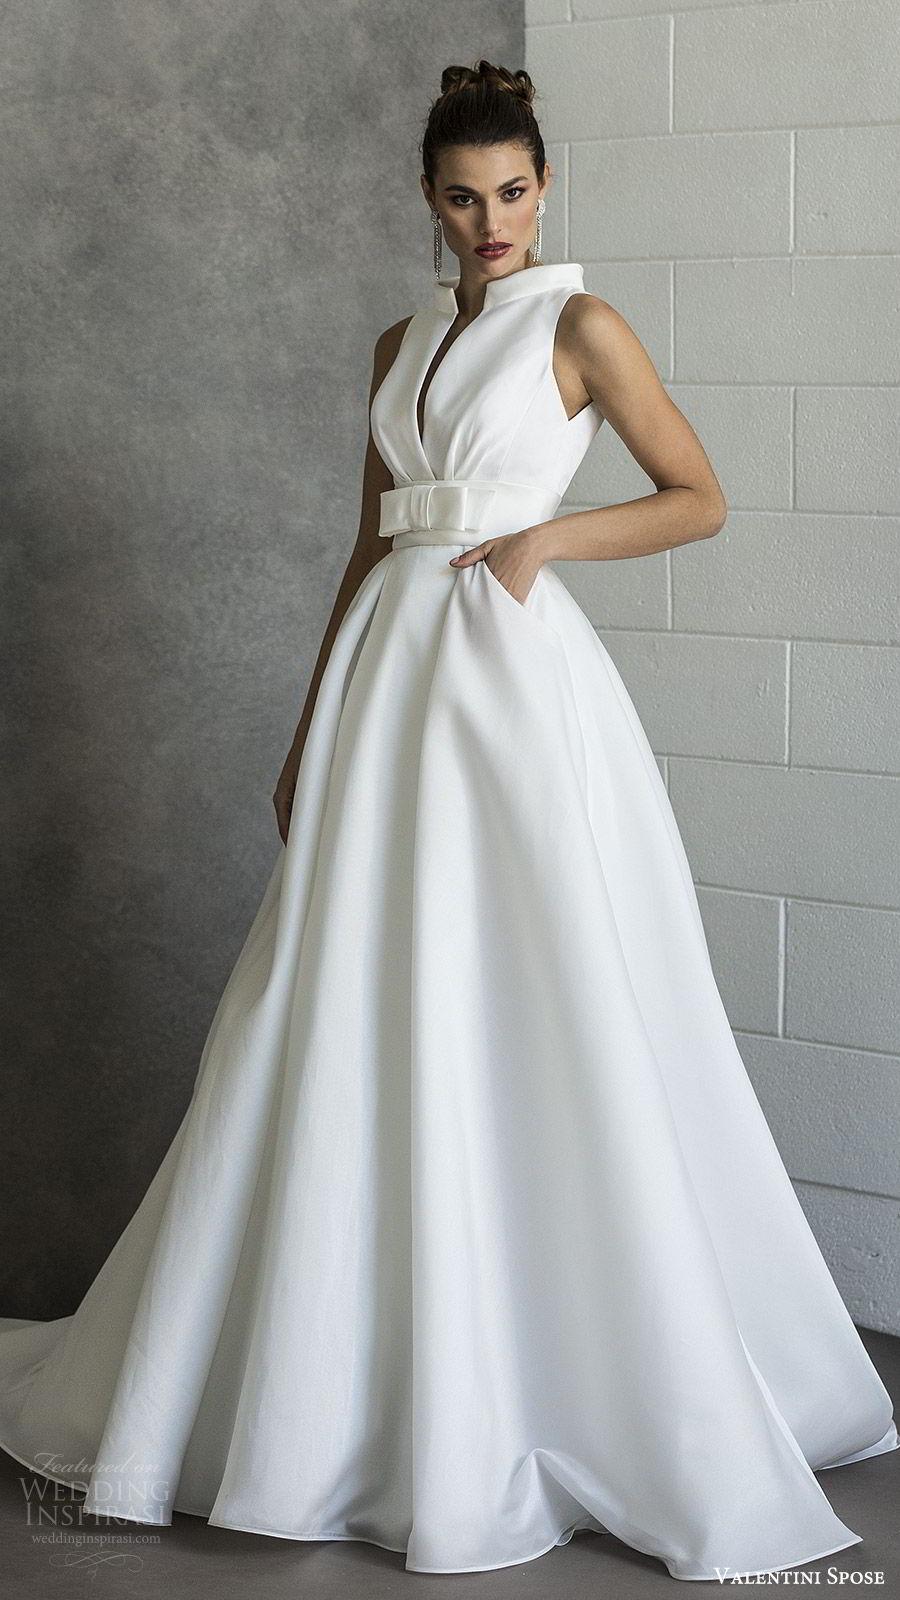 valentini spose spring 2020 bridal sleeveless split funnel neck a line ball gown wedding dress (16) pocket bow waist minimal modern chapel train mv